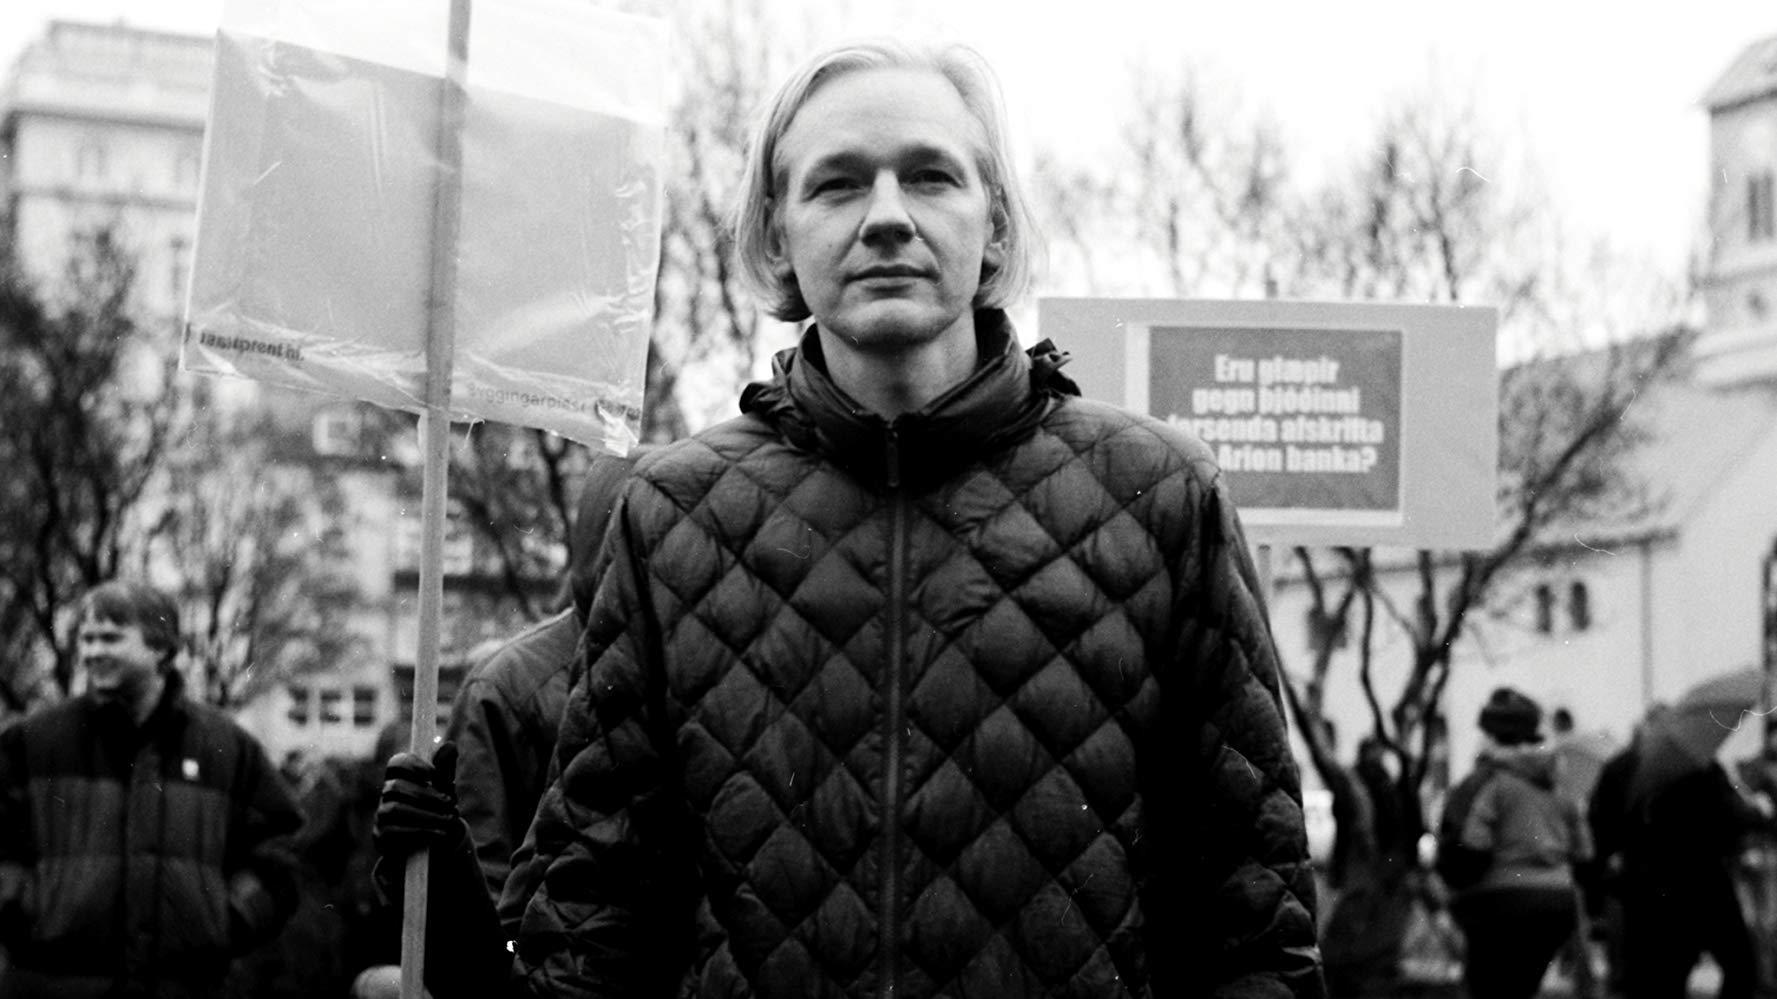 فيلم We Steal Secrets The Story Of WikiLeaks 2013 مترجم